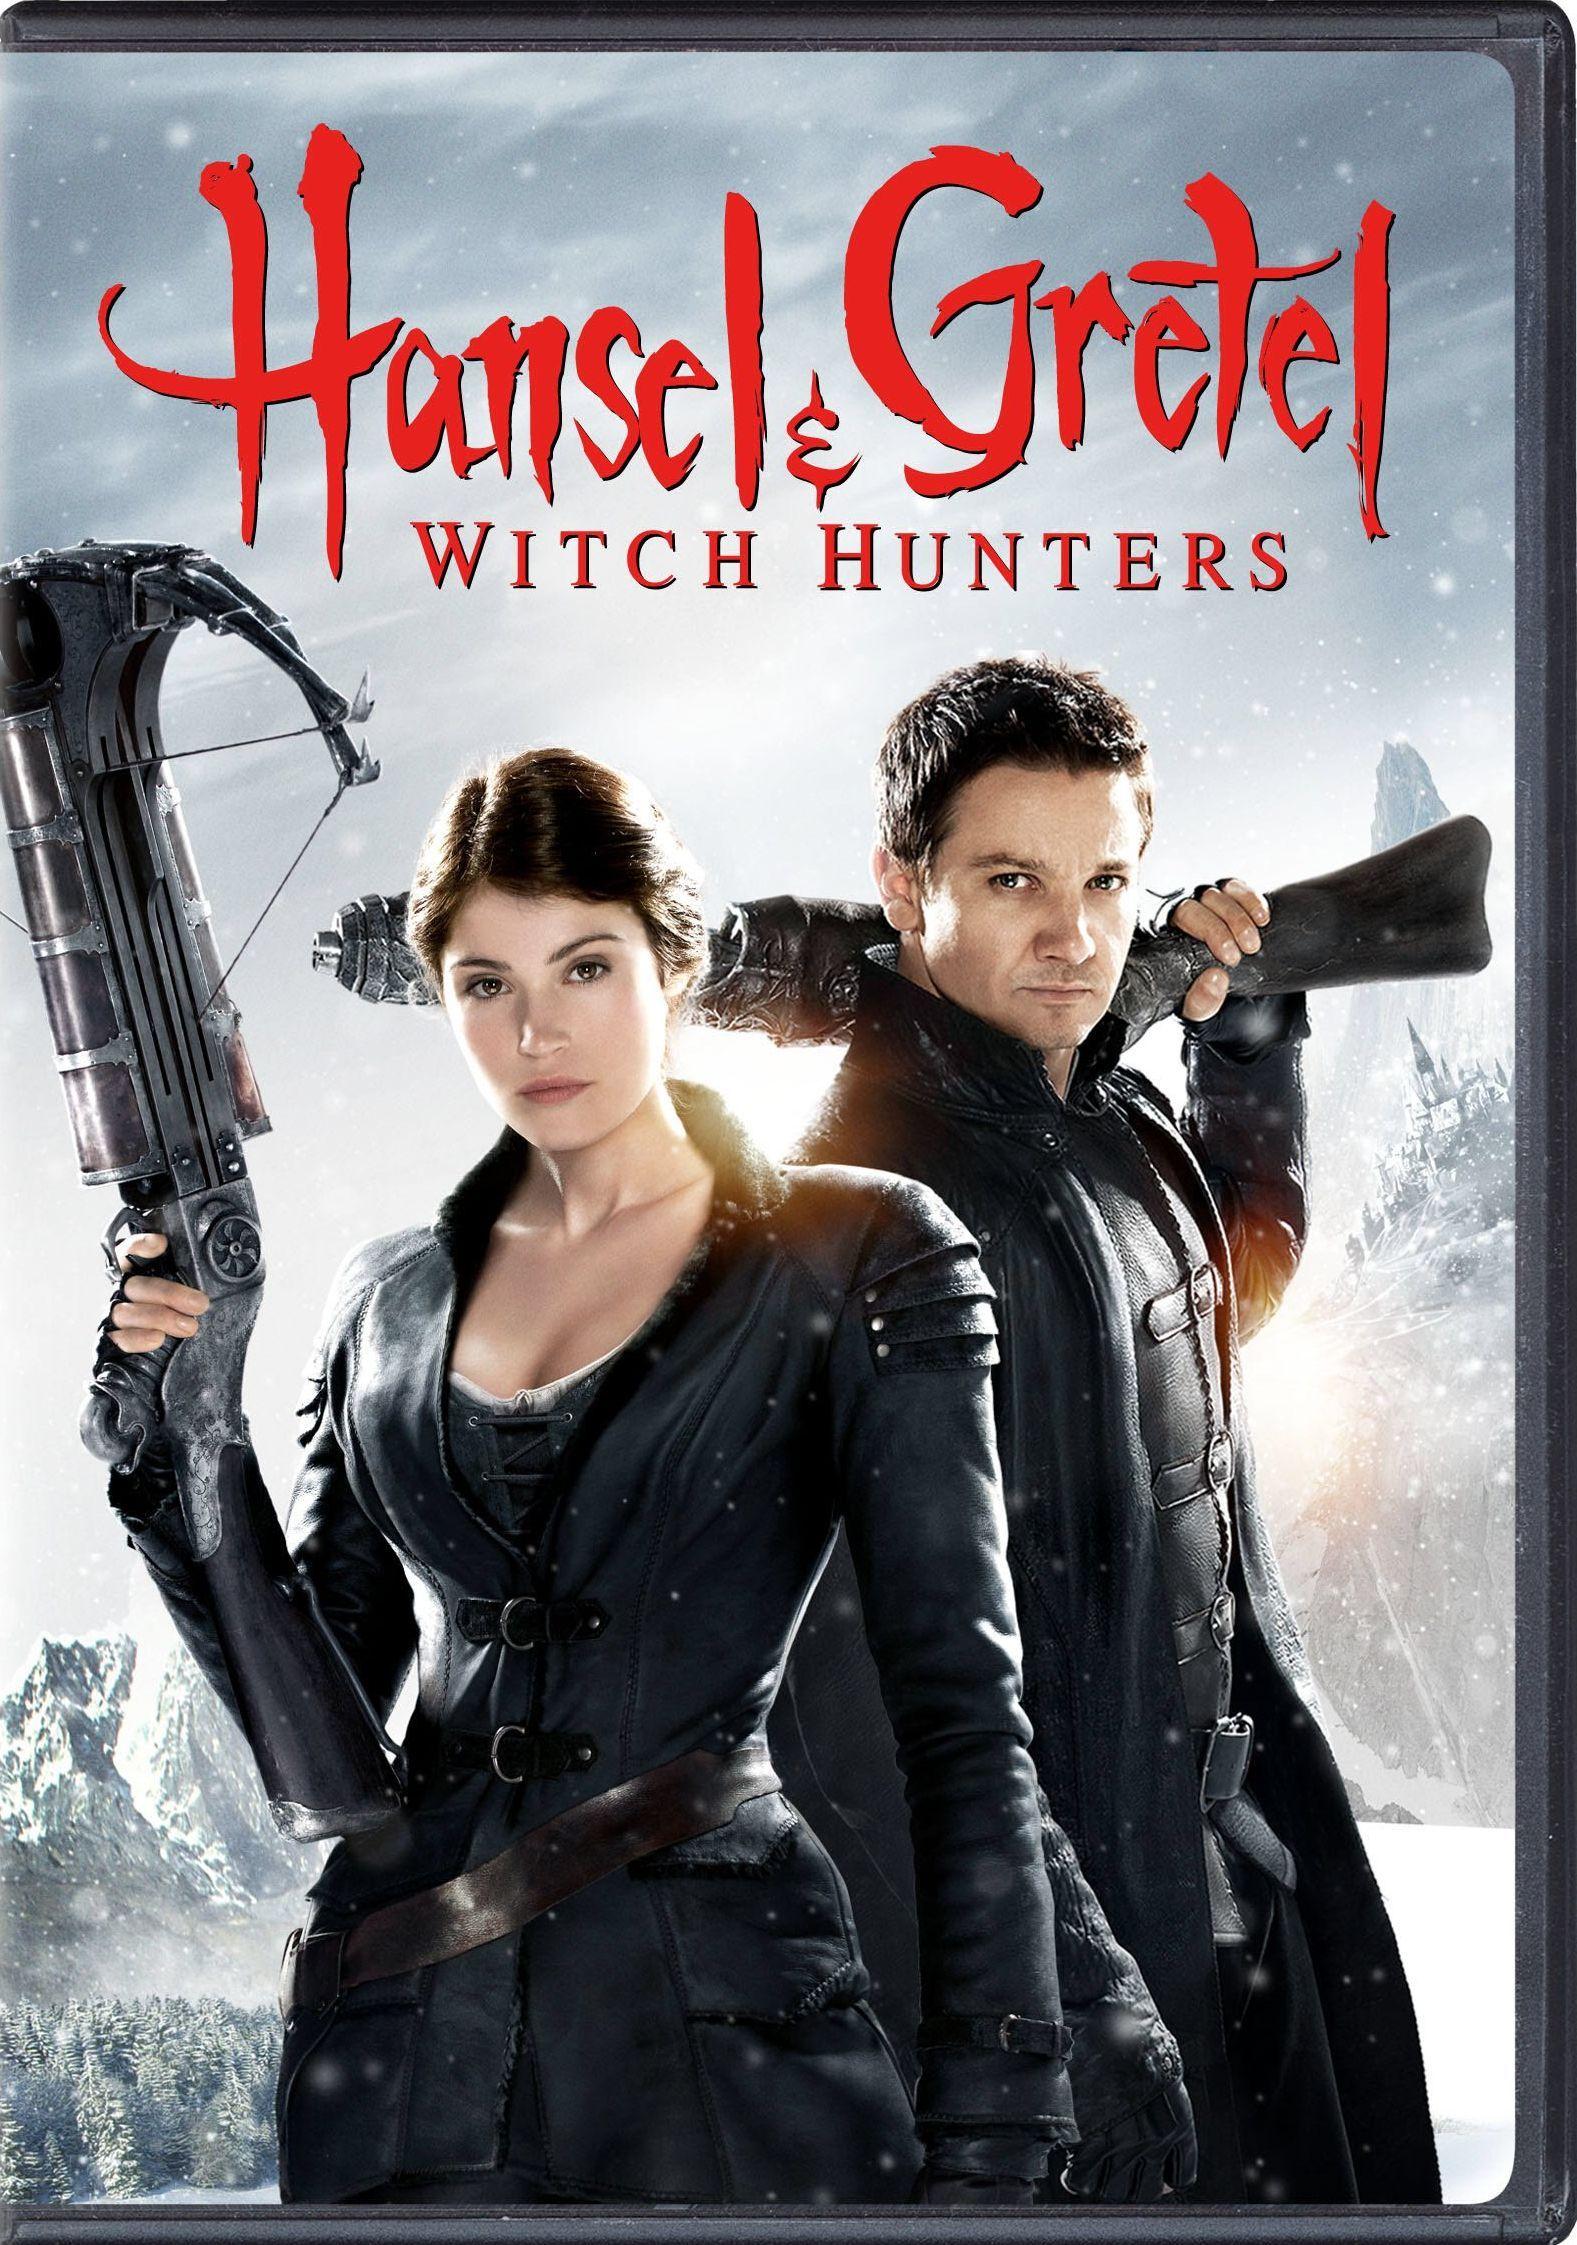 Item Display Hansel Gretel Videorecording Witch Hunters Hunter Movie Jeremy Renner Renner